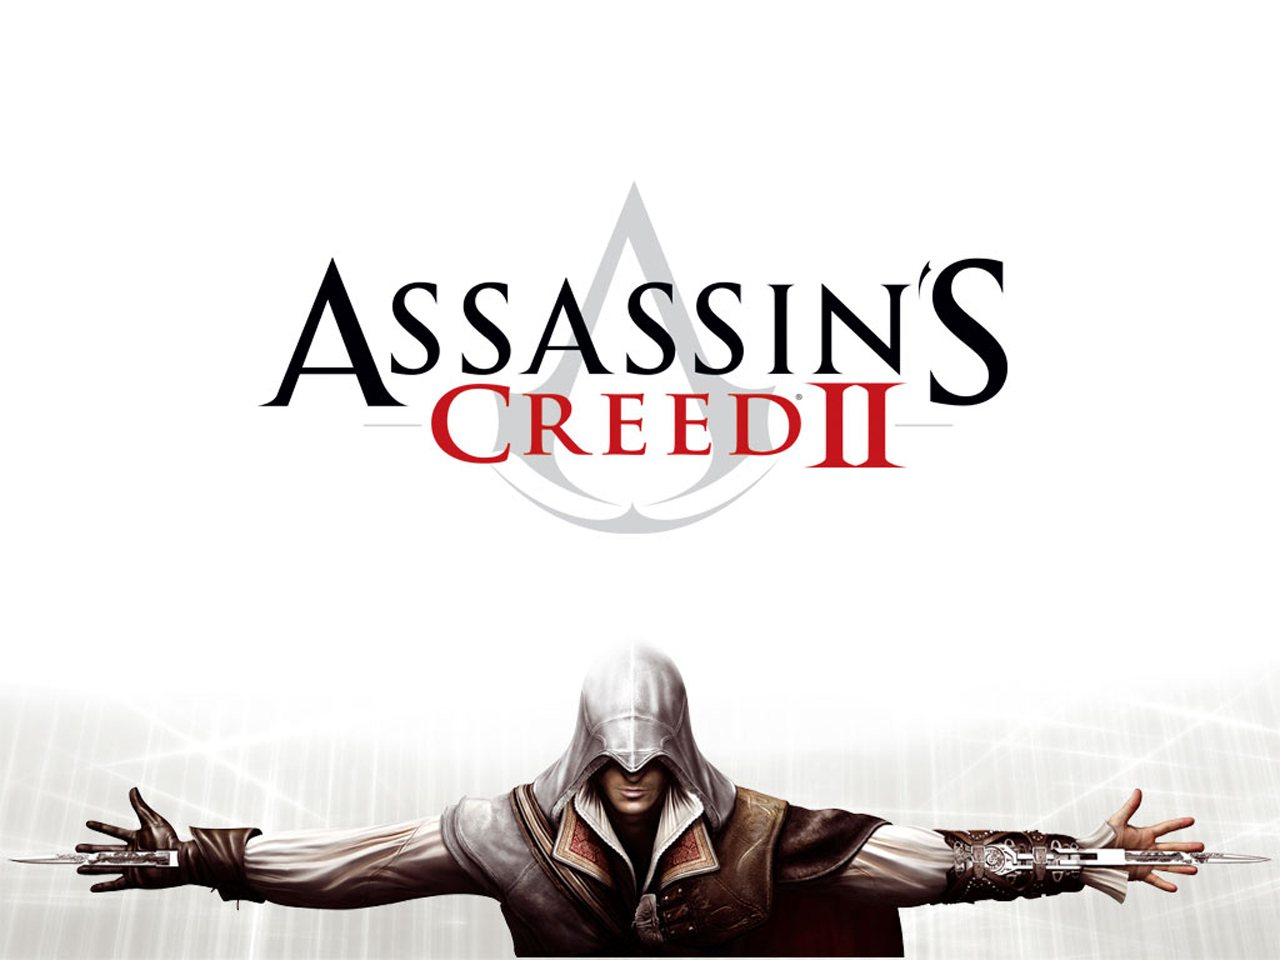 Assasin Creed 2 wallpaper